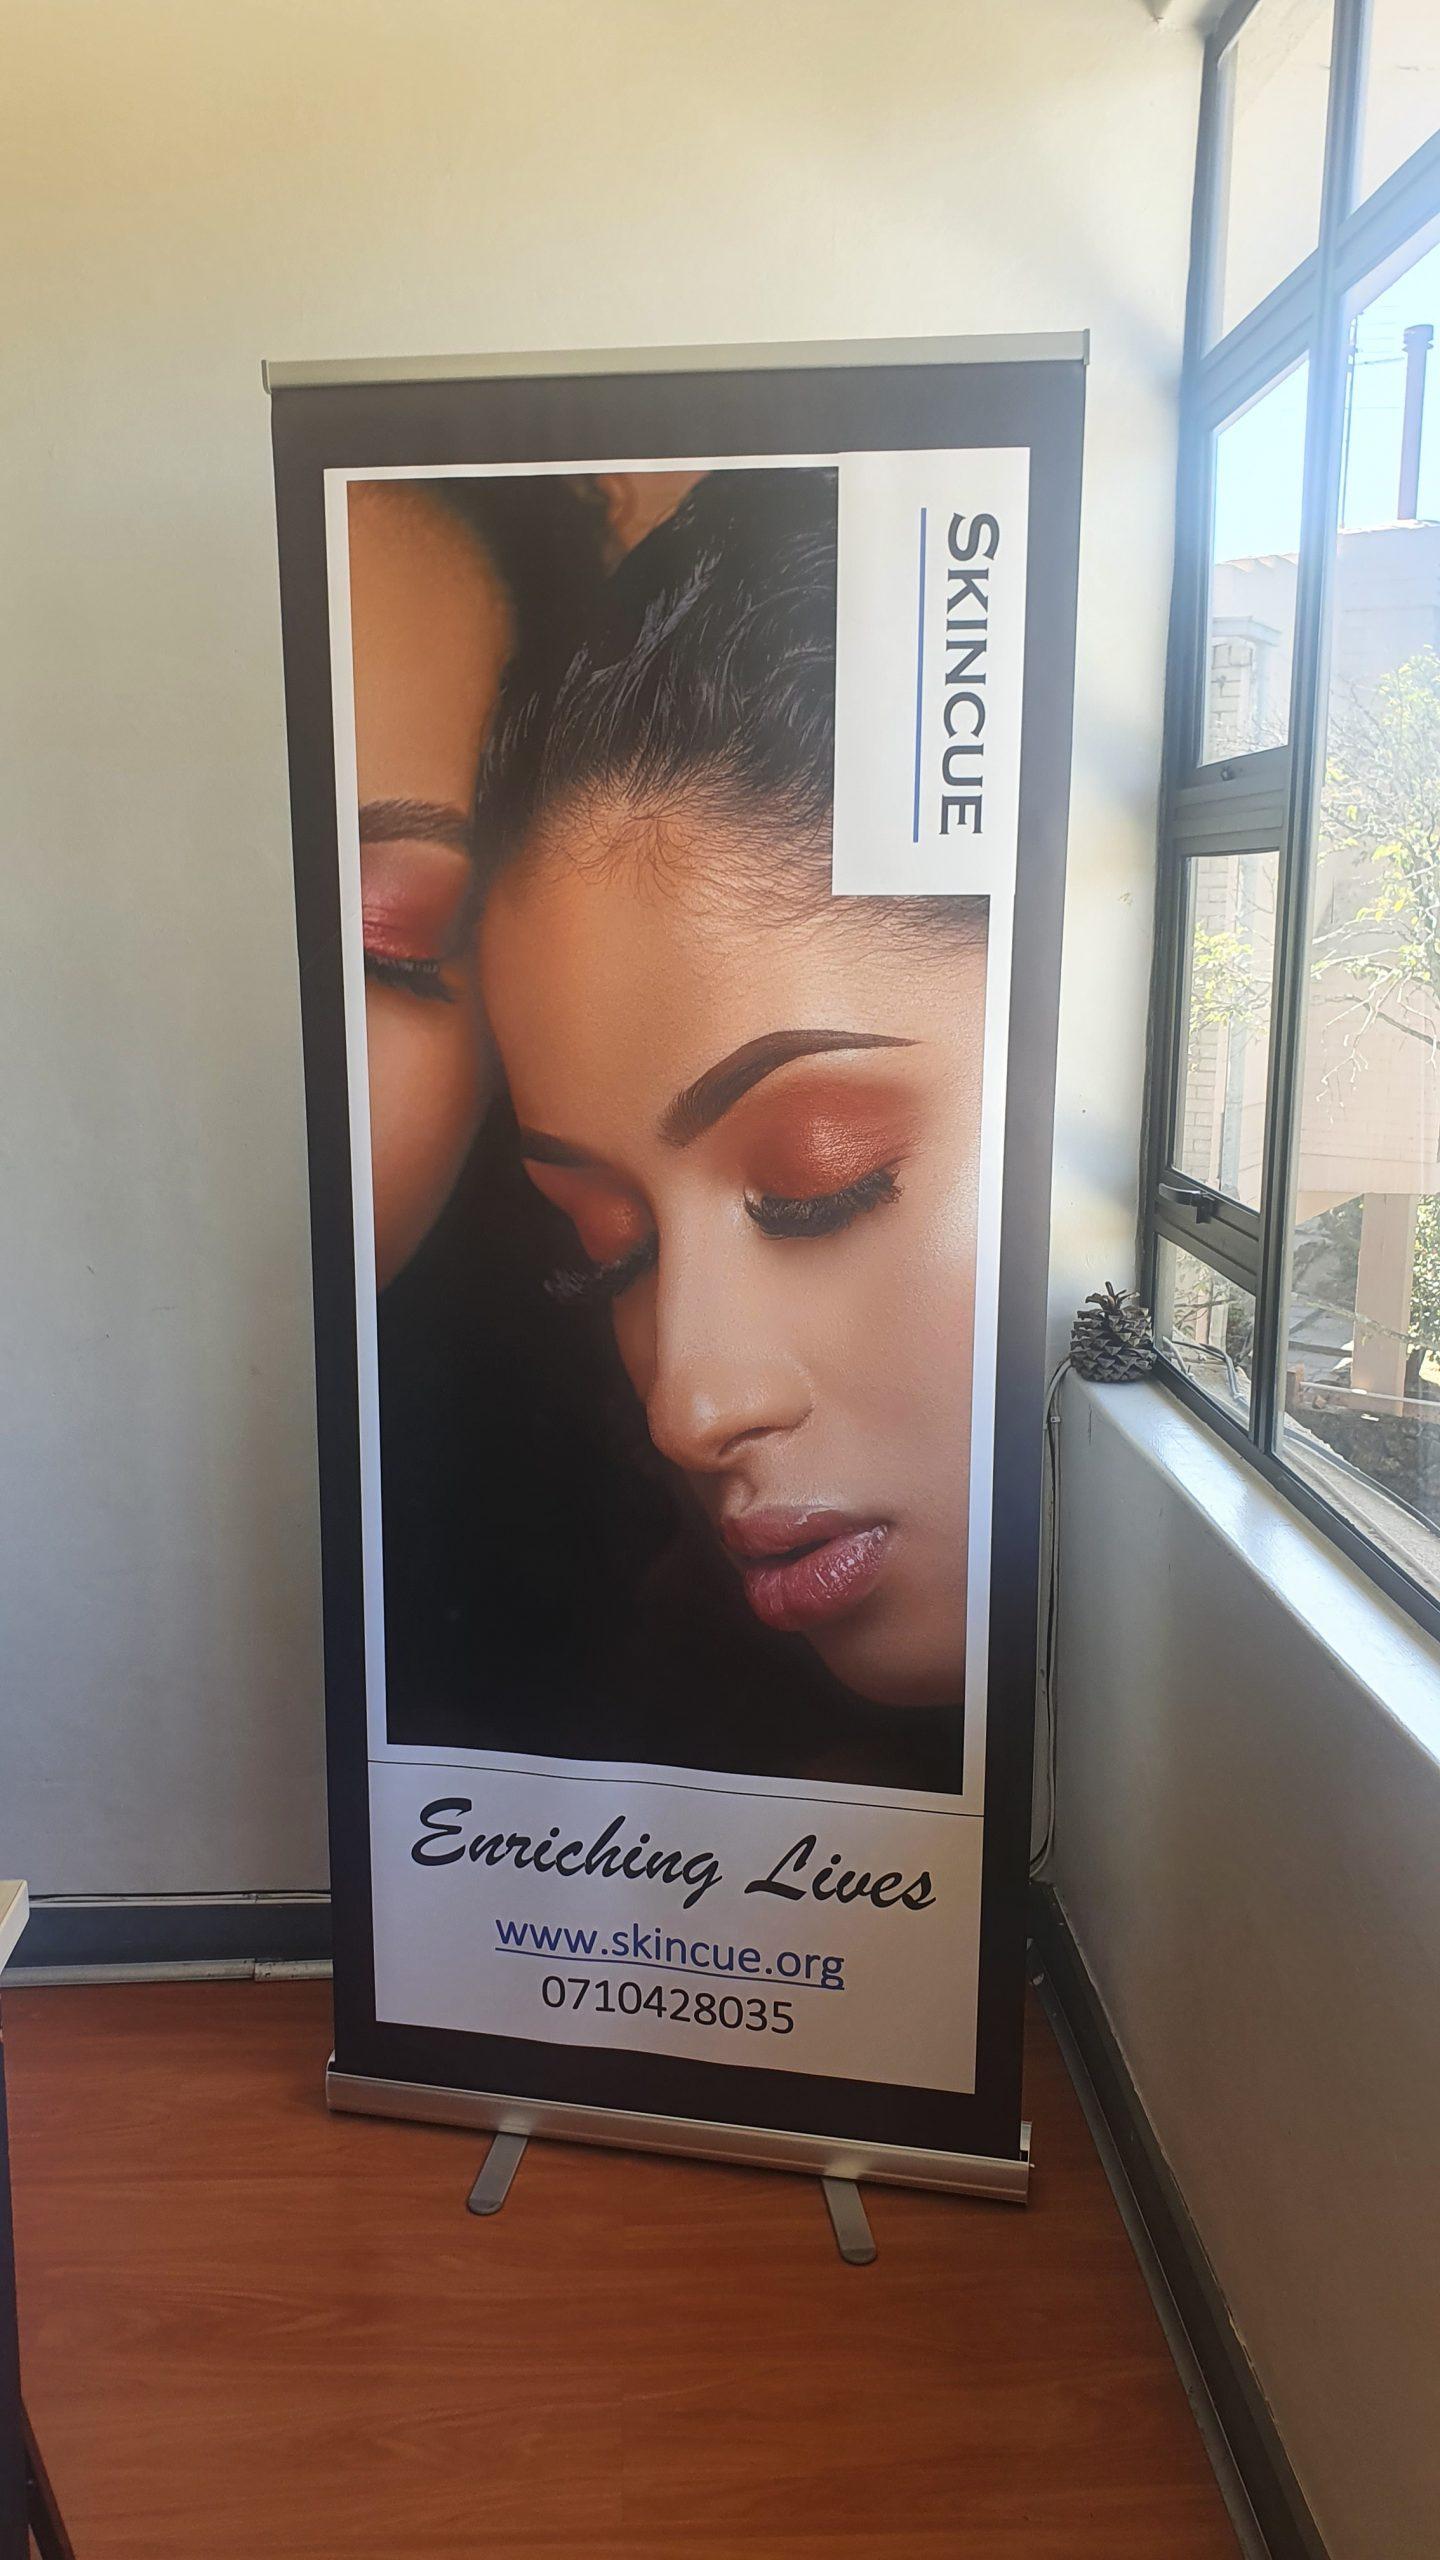 Skincue banner picture